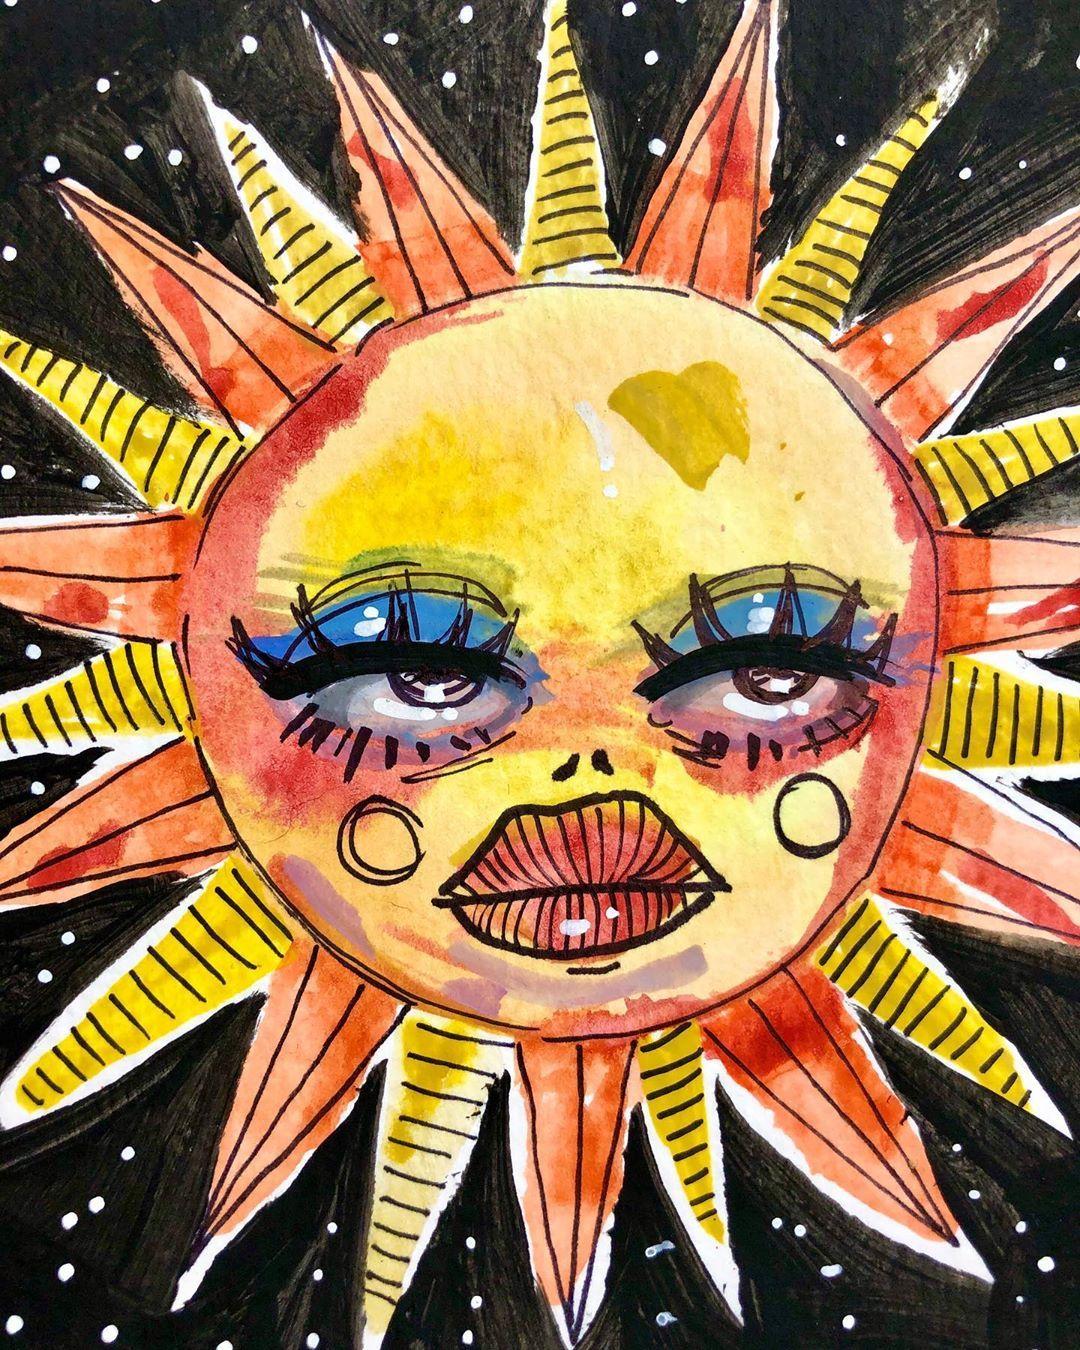 Megz On Instagram A Little Tiktok Art Challenge Artbymegz On Tiktok Hippie Painting Hippie Art Art